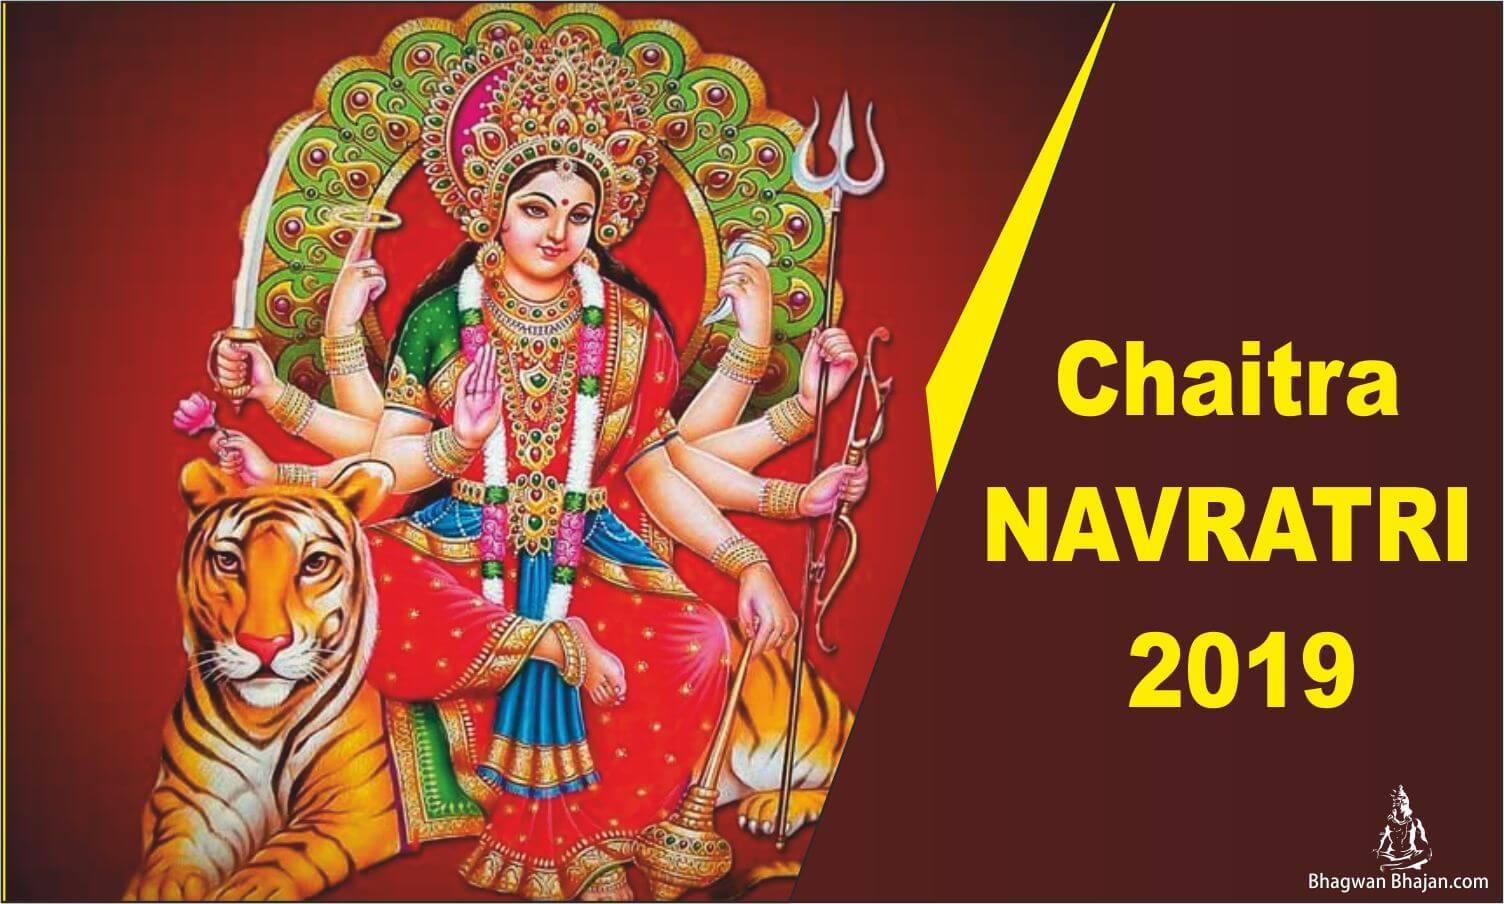 maa durga-chaitra navratri wallpaper